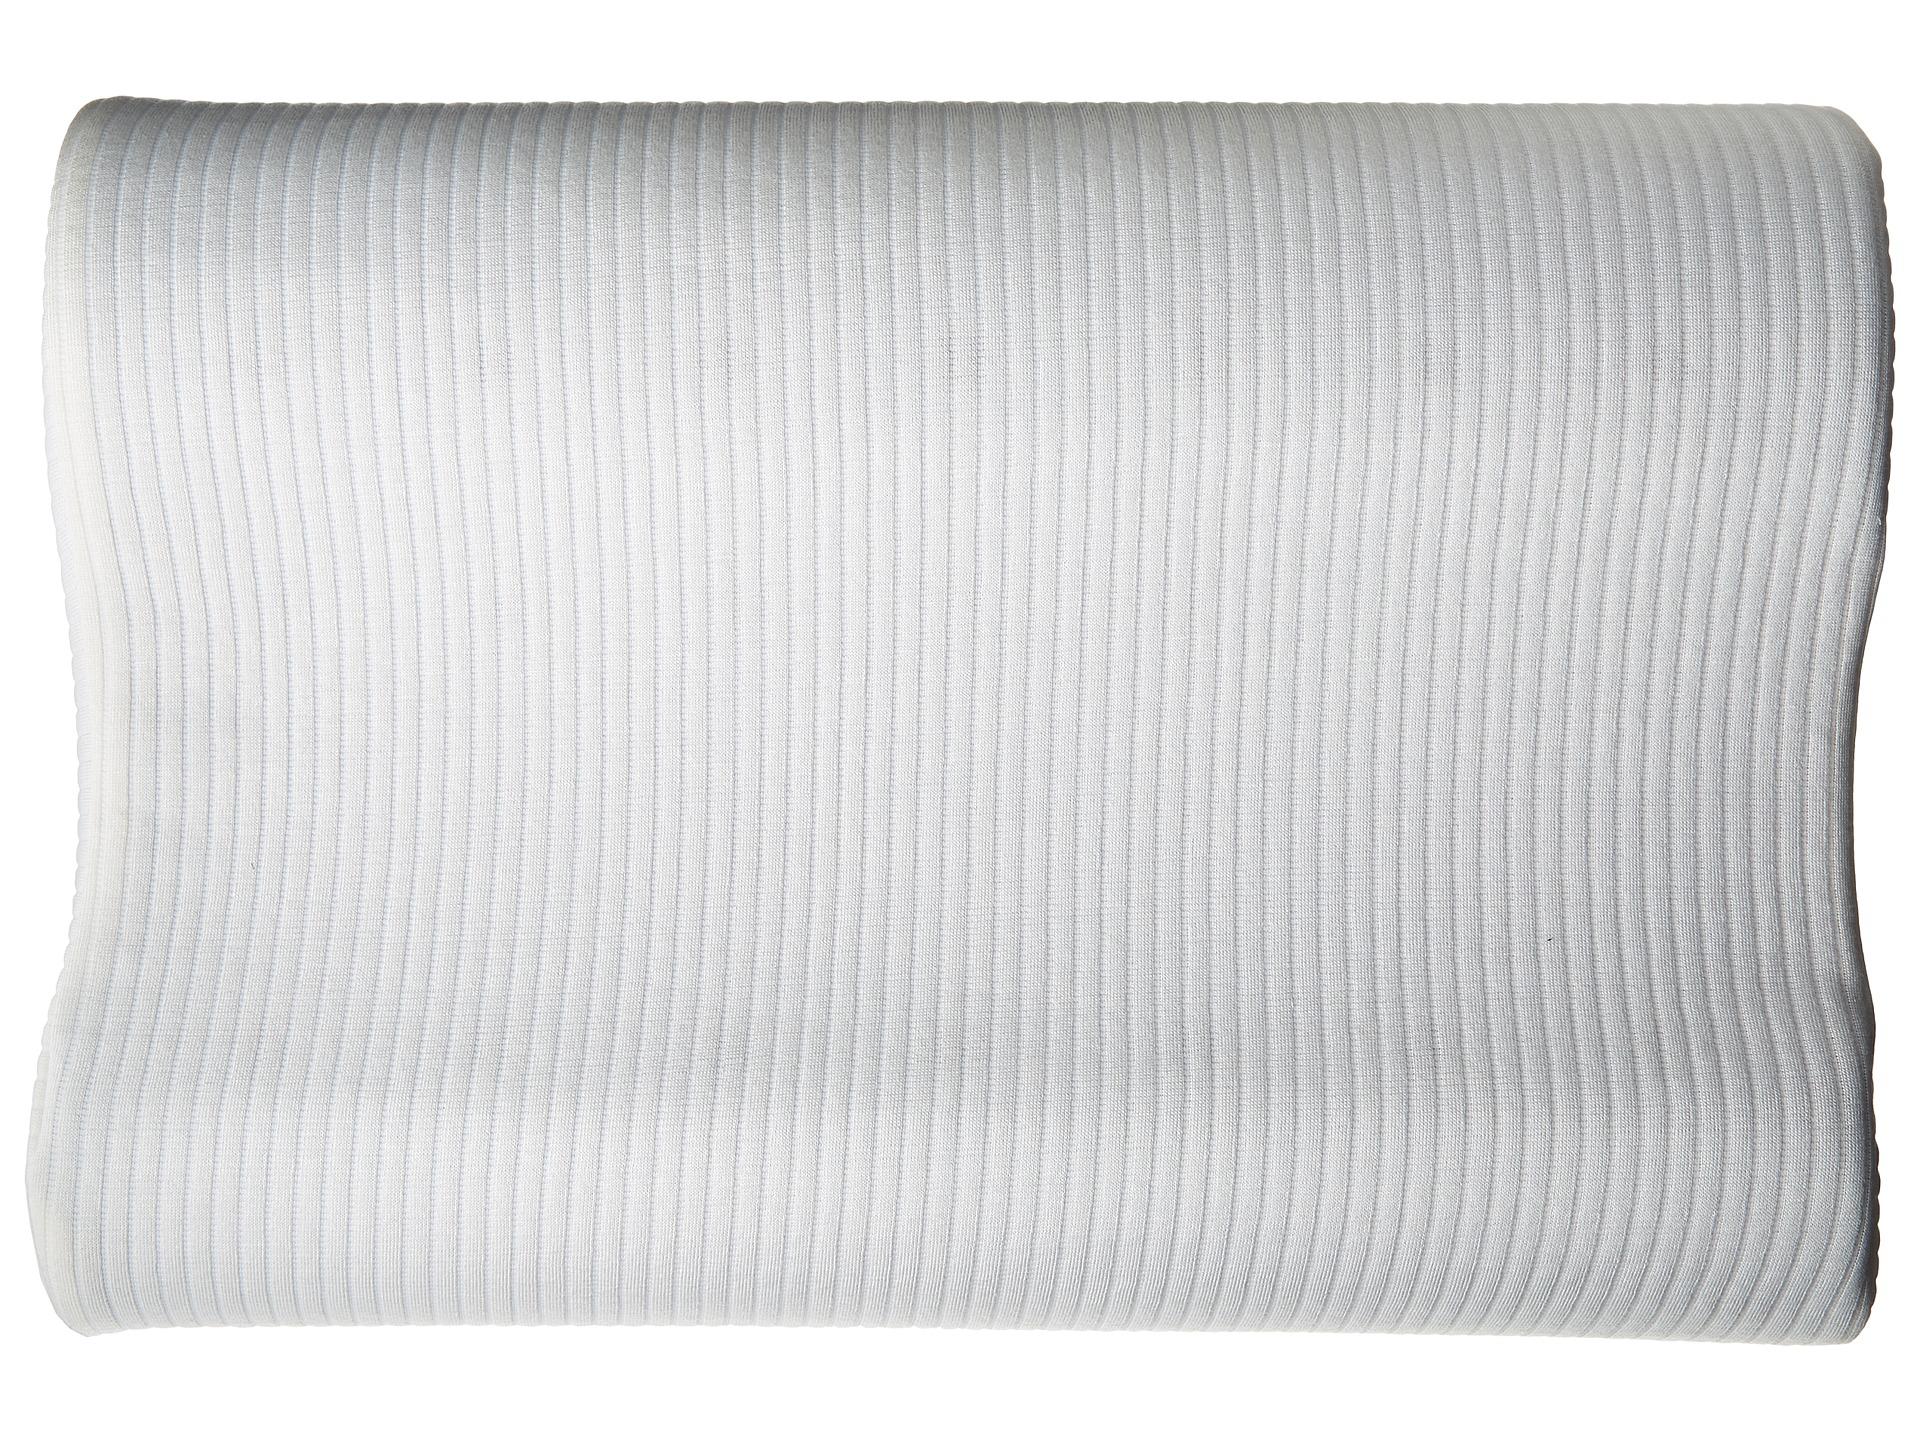 soft tex classic contour memory foam bed pillow standard